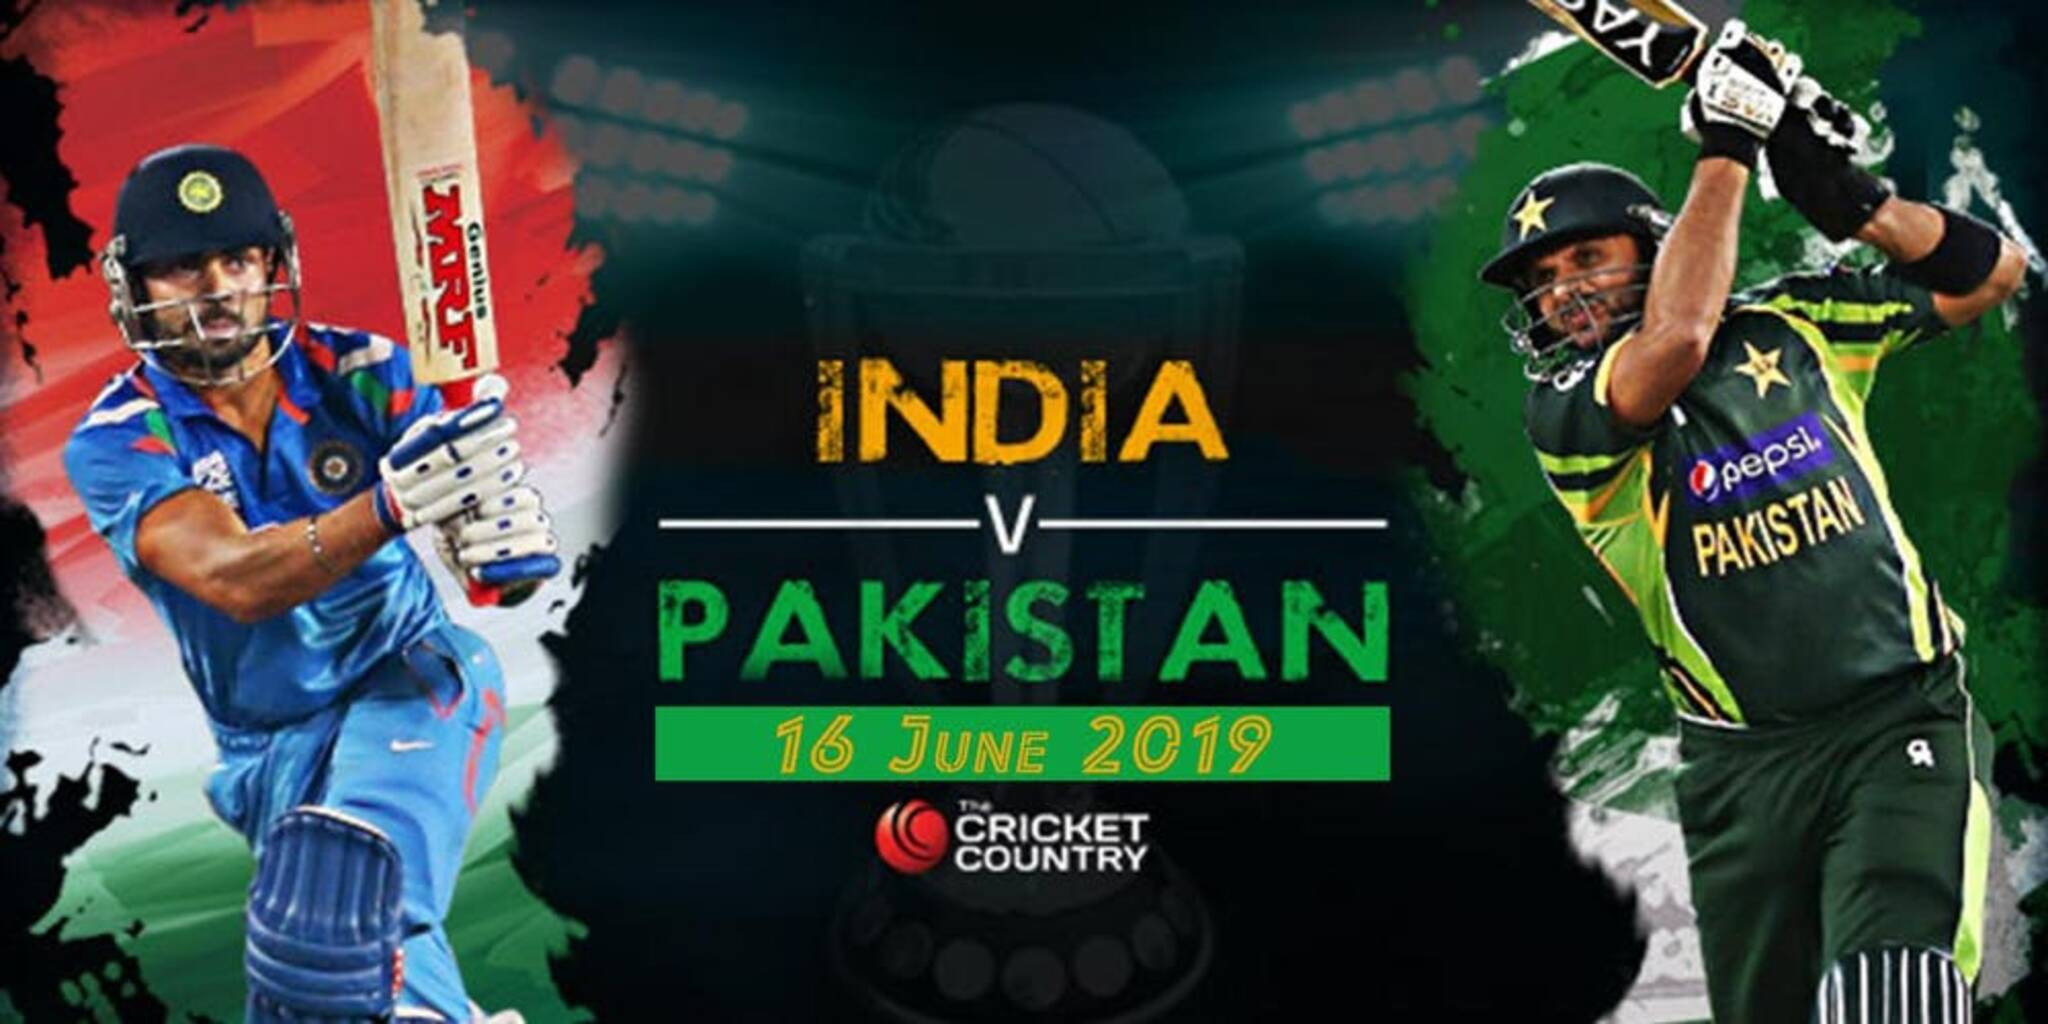 India Vs Pakistan Icc Cricket World Cup 2019